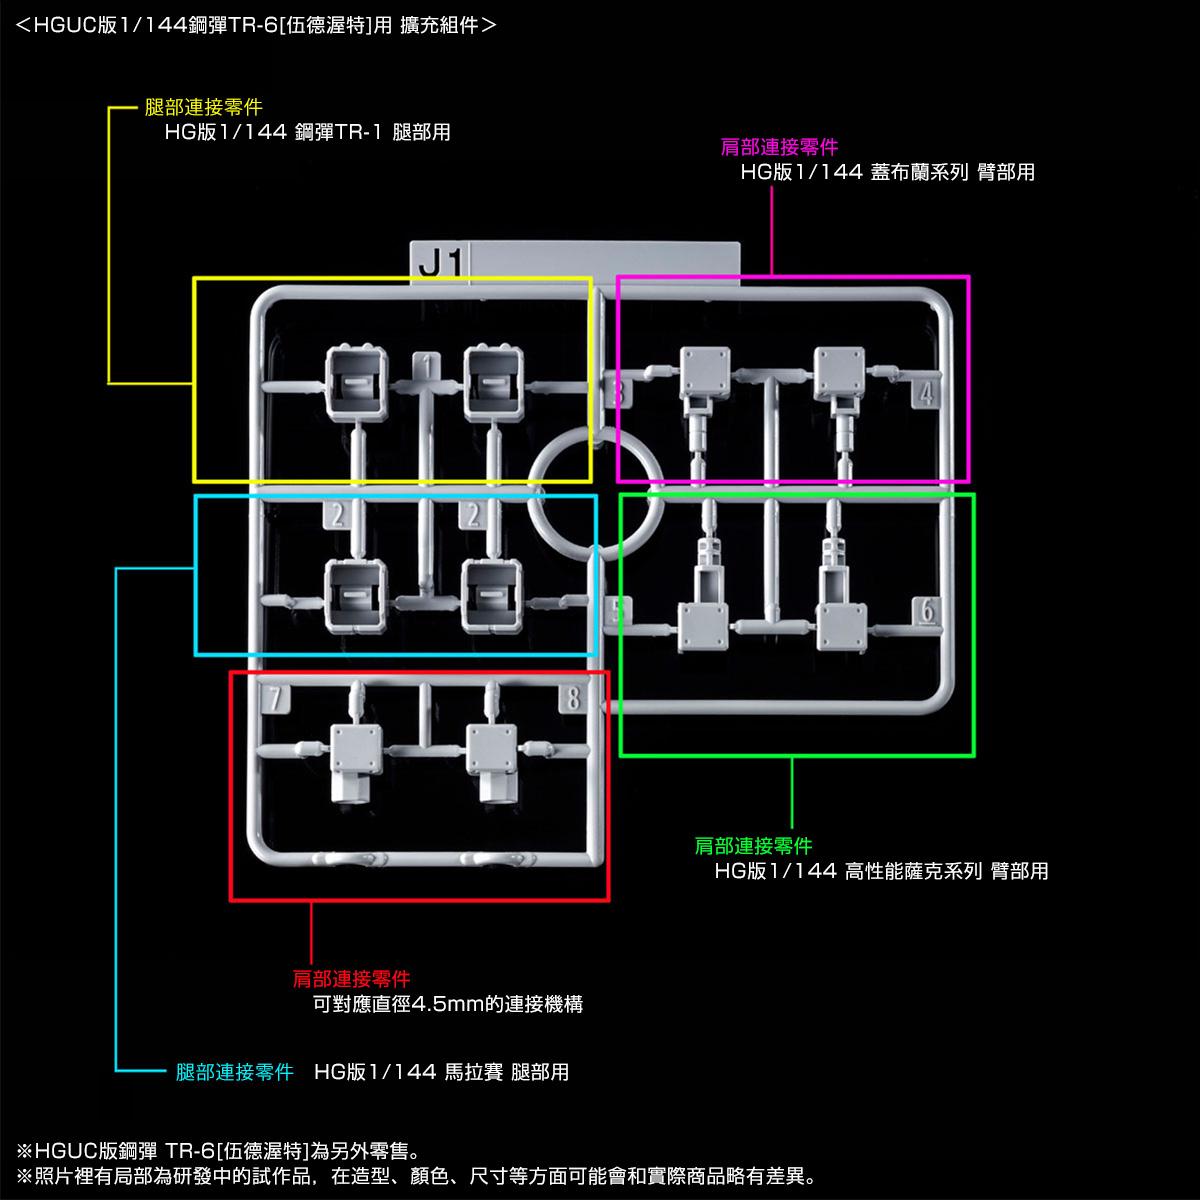 HG 1/144 GUNDAM TR-1 [ADVANCED HAZEL] & EXPANSION PARTS SET for GUNDAM TR-6